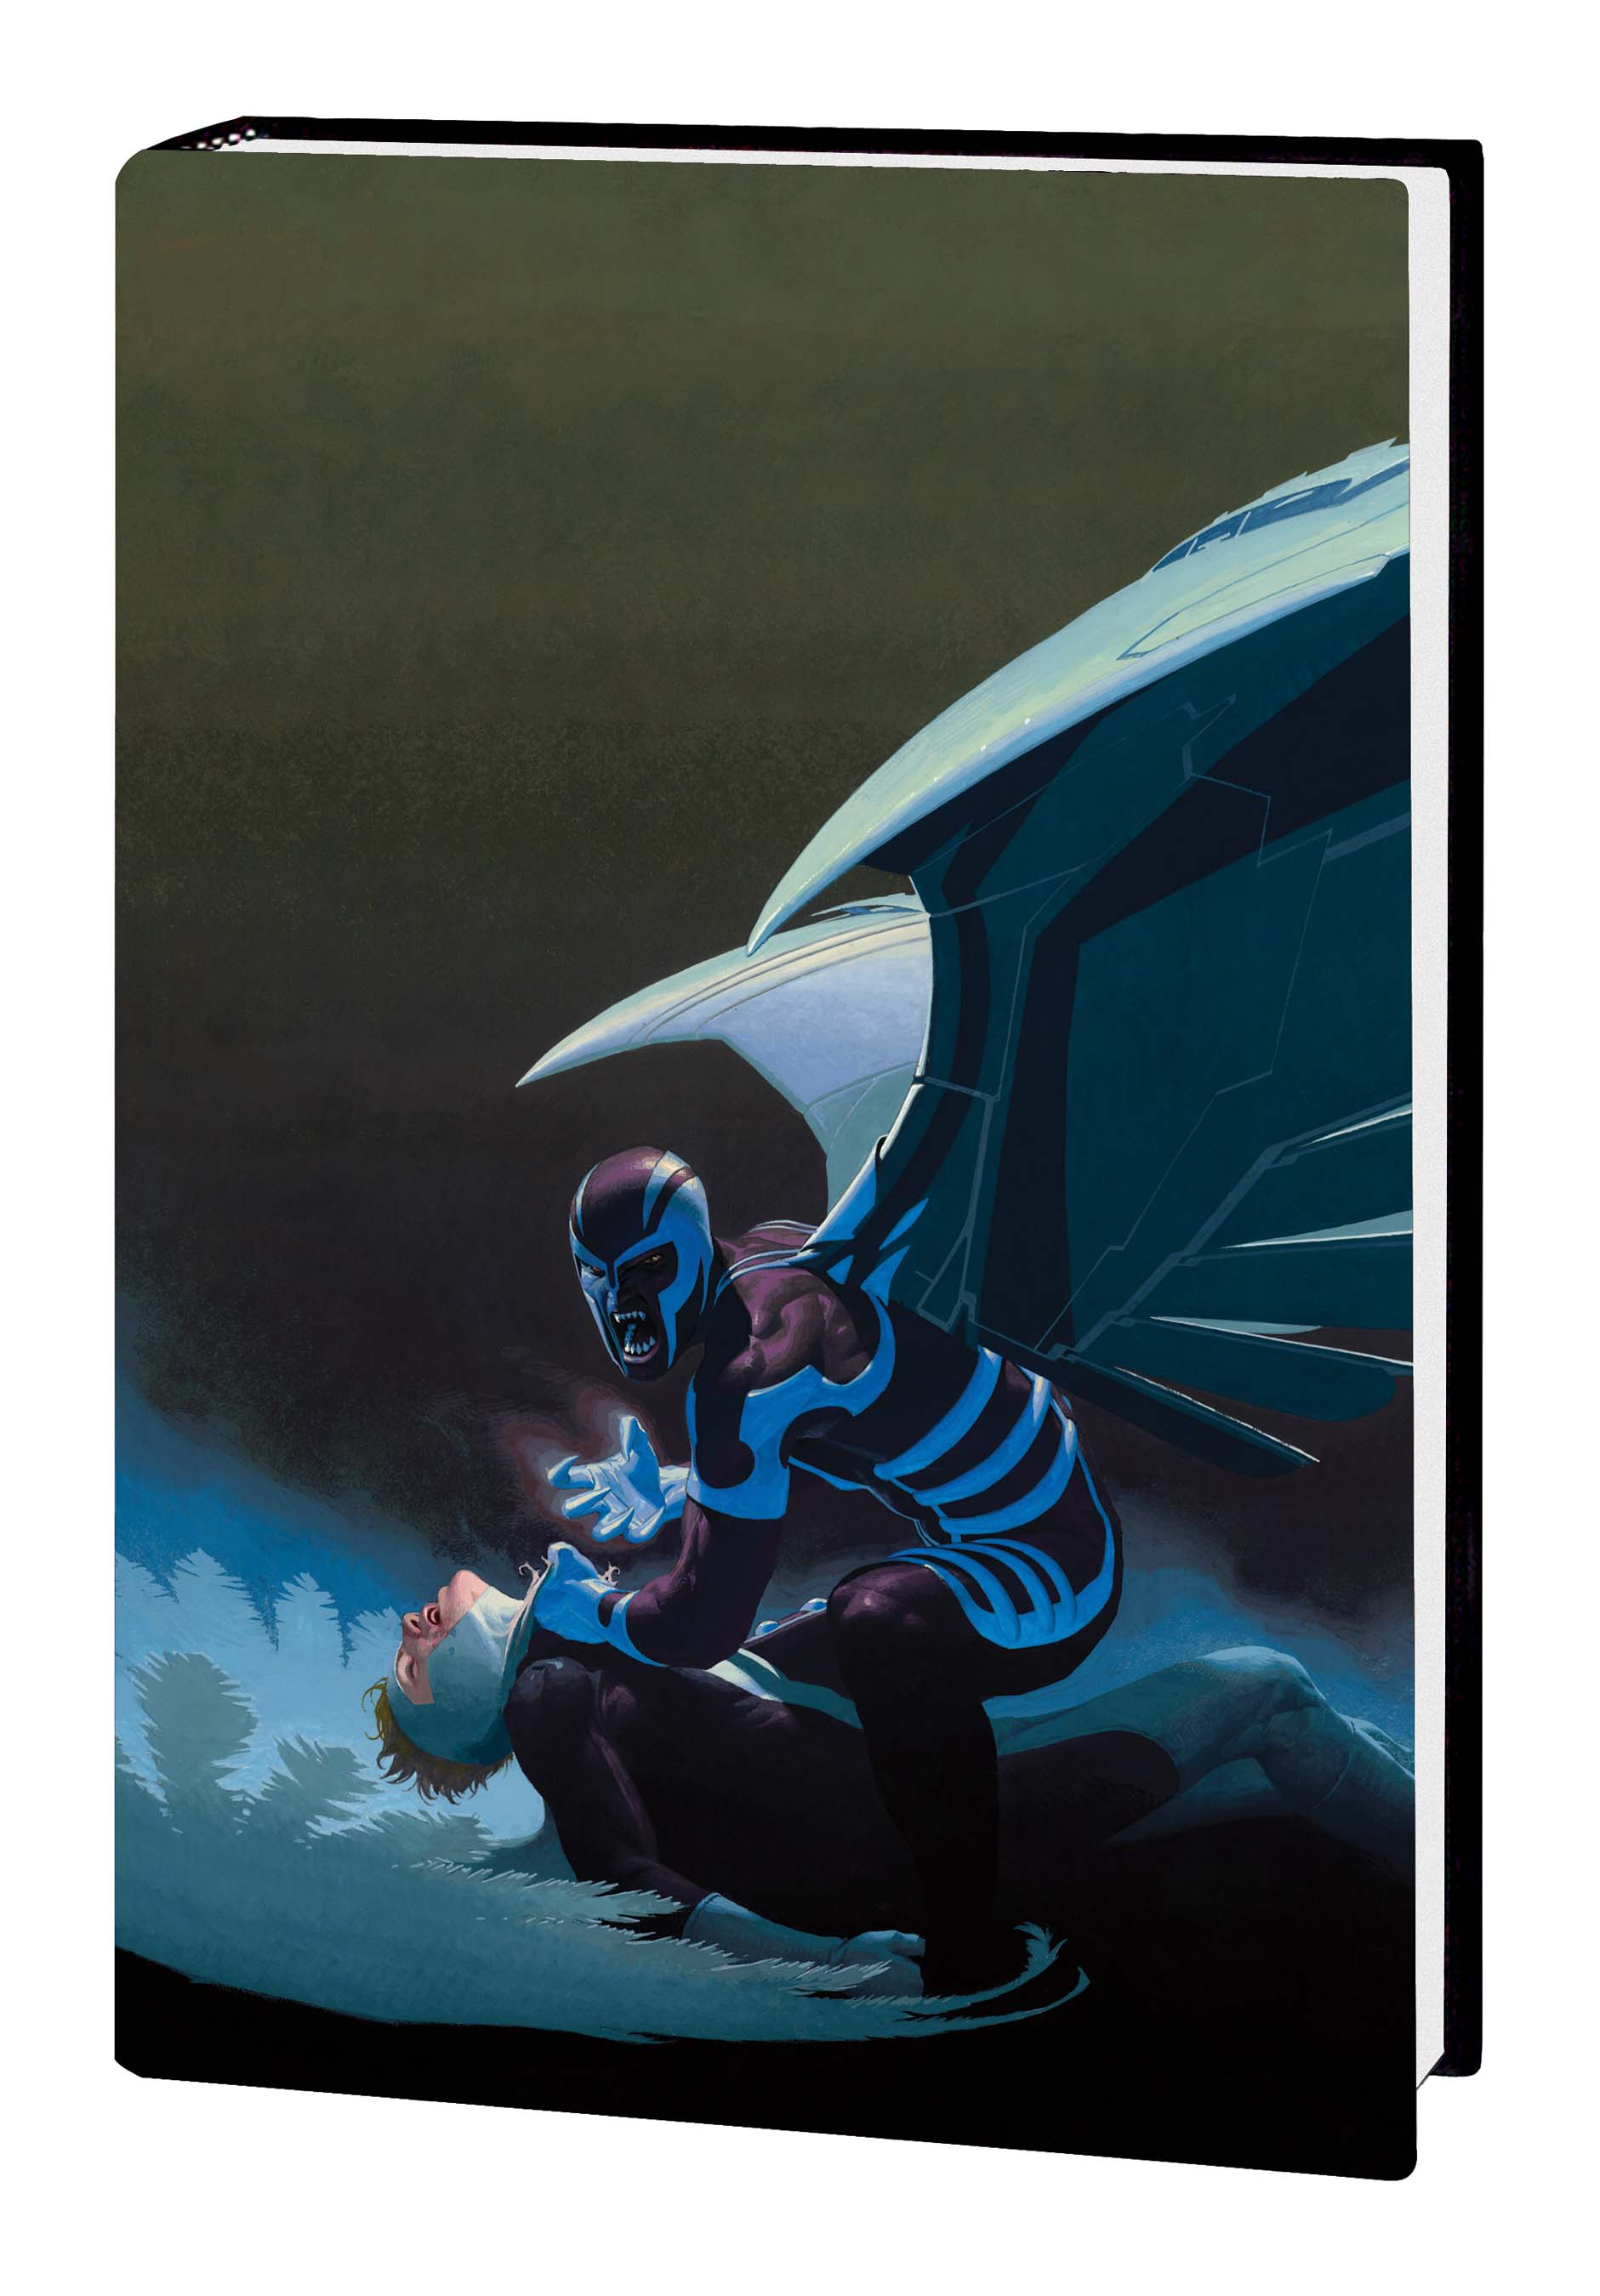 UNCANNY X-FORCE: THE DARK ANGEL SAGA BOOK 1 PREMIERE HC (Hardcover)